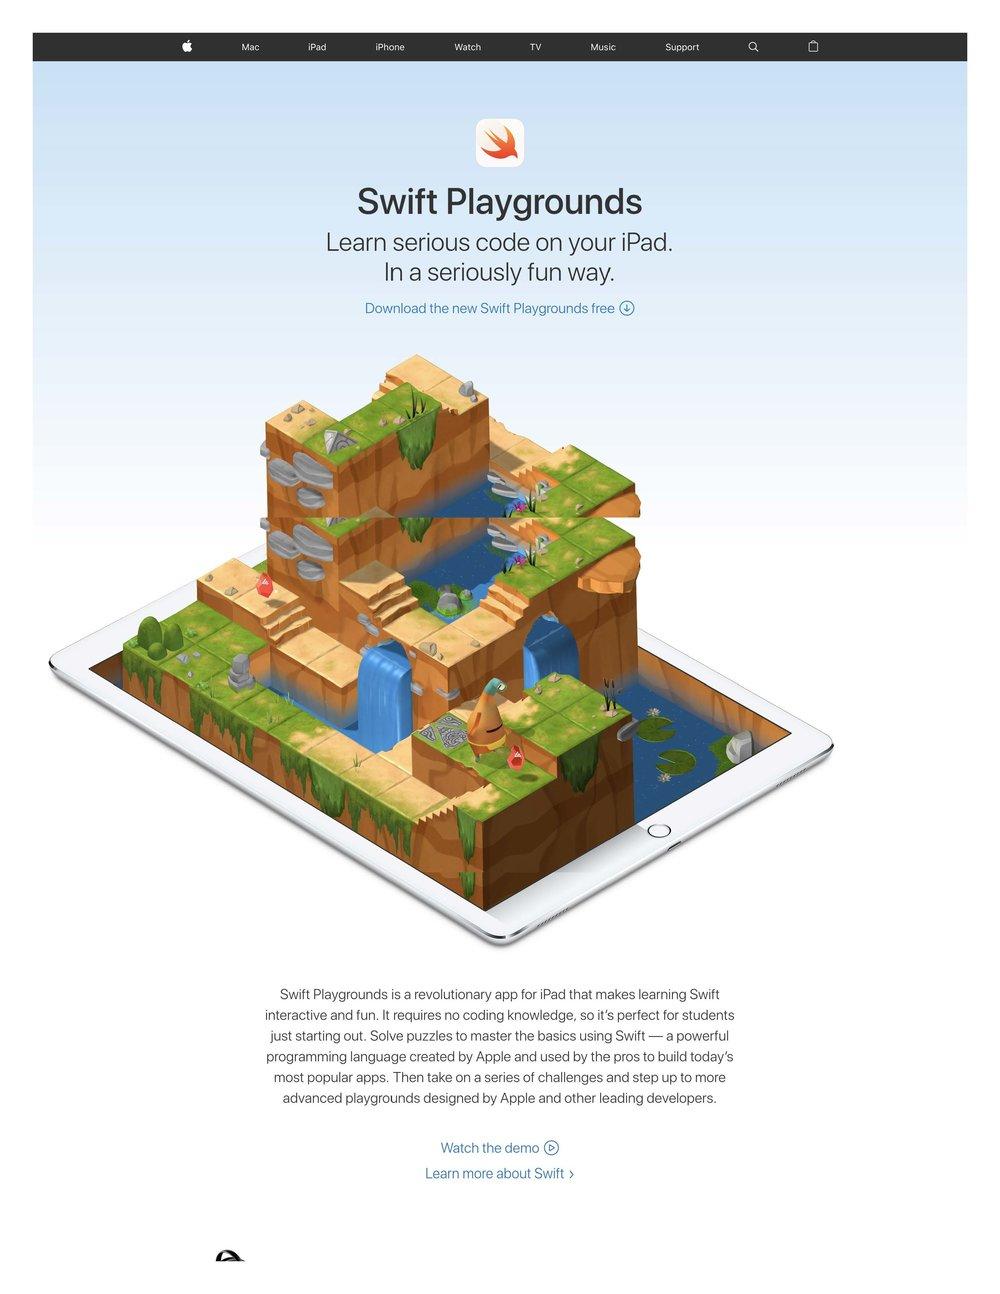 screencapture-apple-swift-playgrounds-2019-03-10-12_50_37_Page_1.jpg